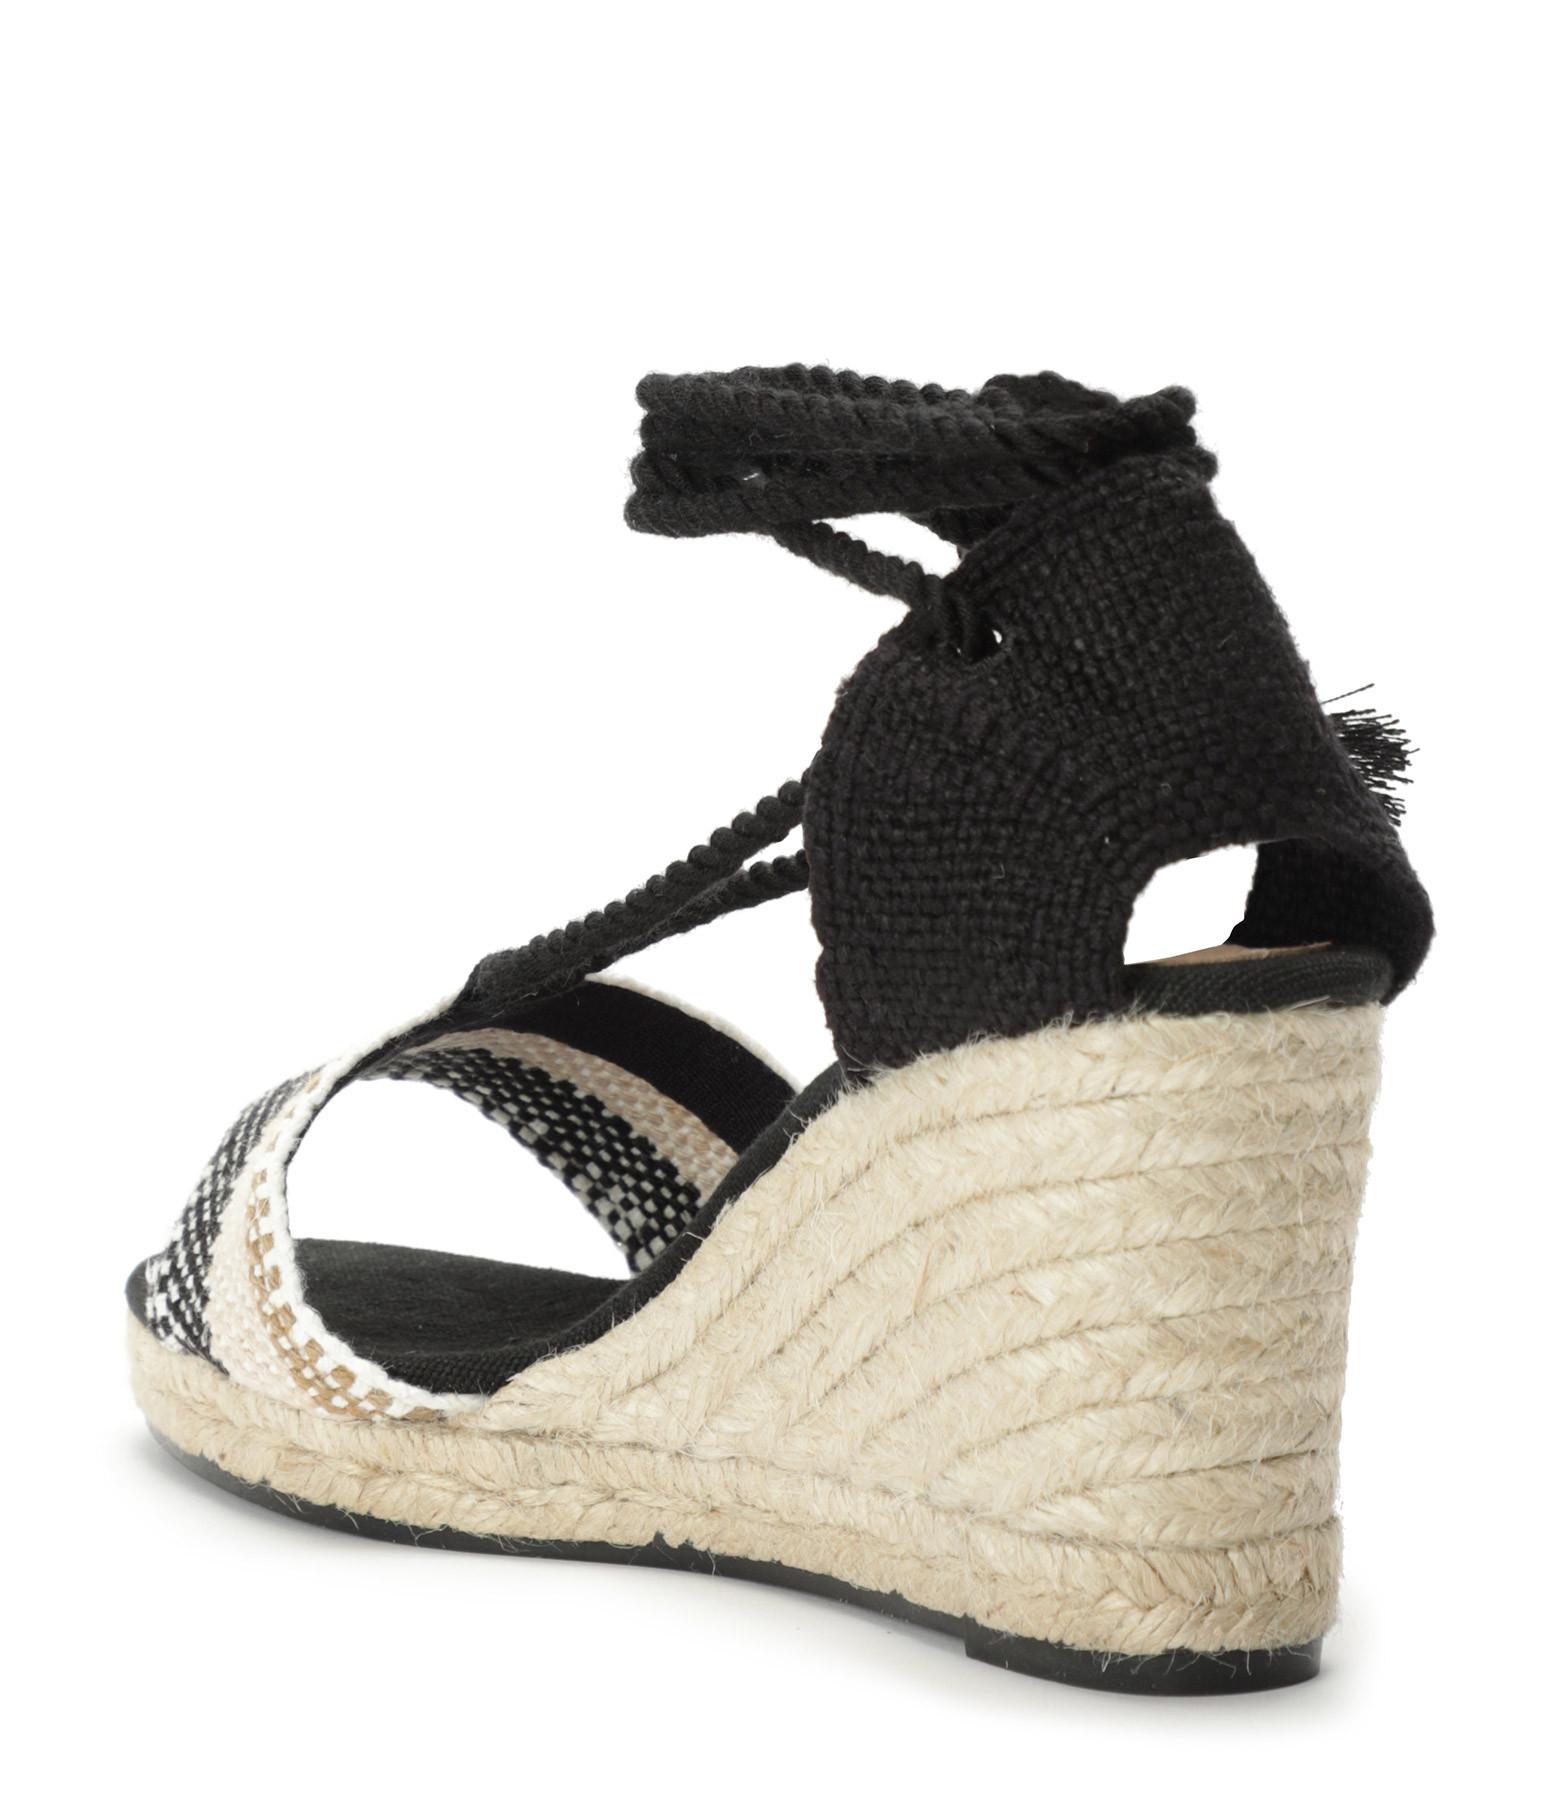 CASTAÑER - Sandales Basile Noir